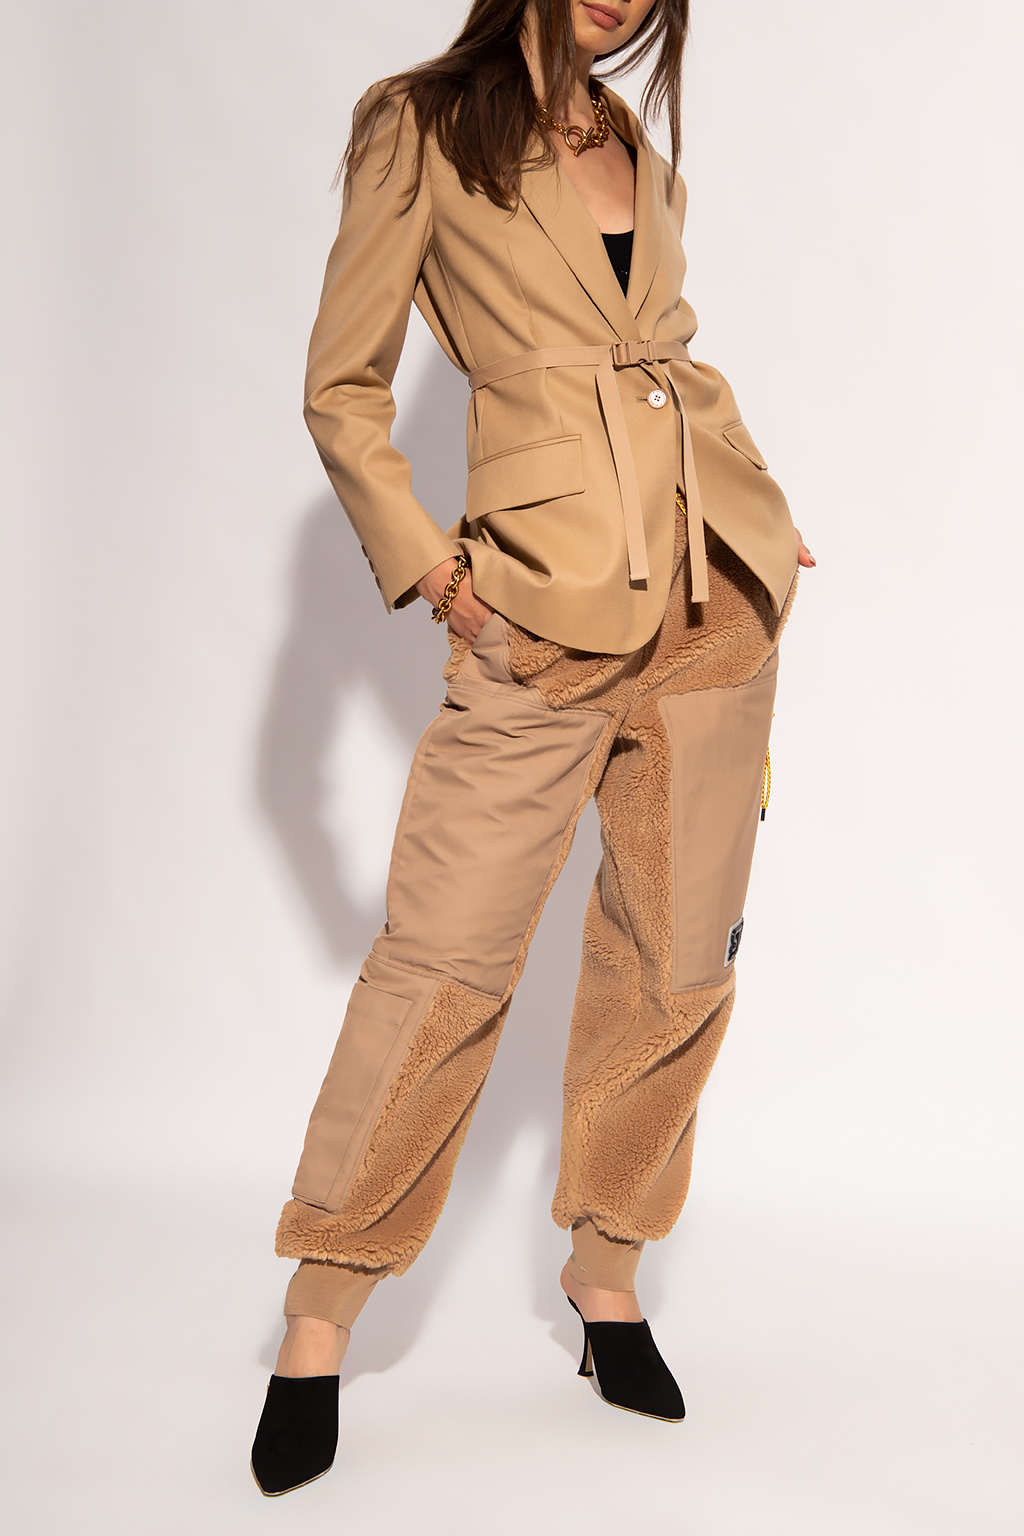 Stella McCartney Blazer with belt